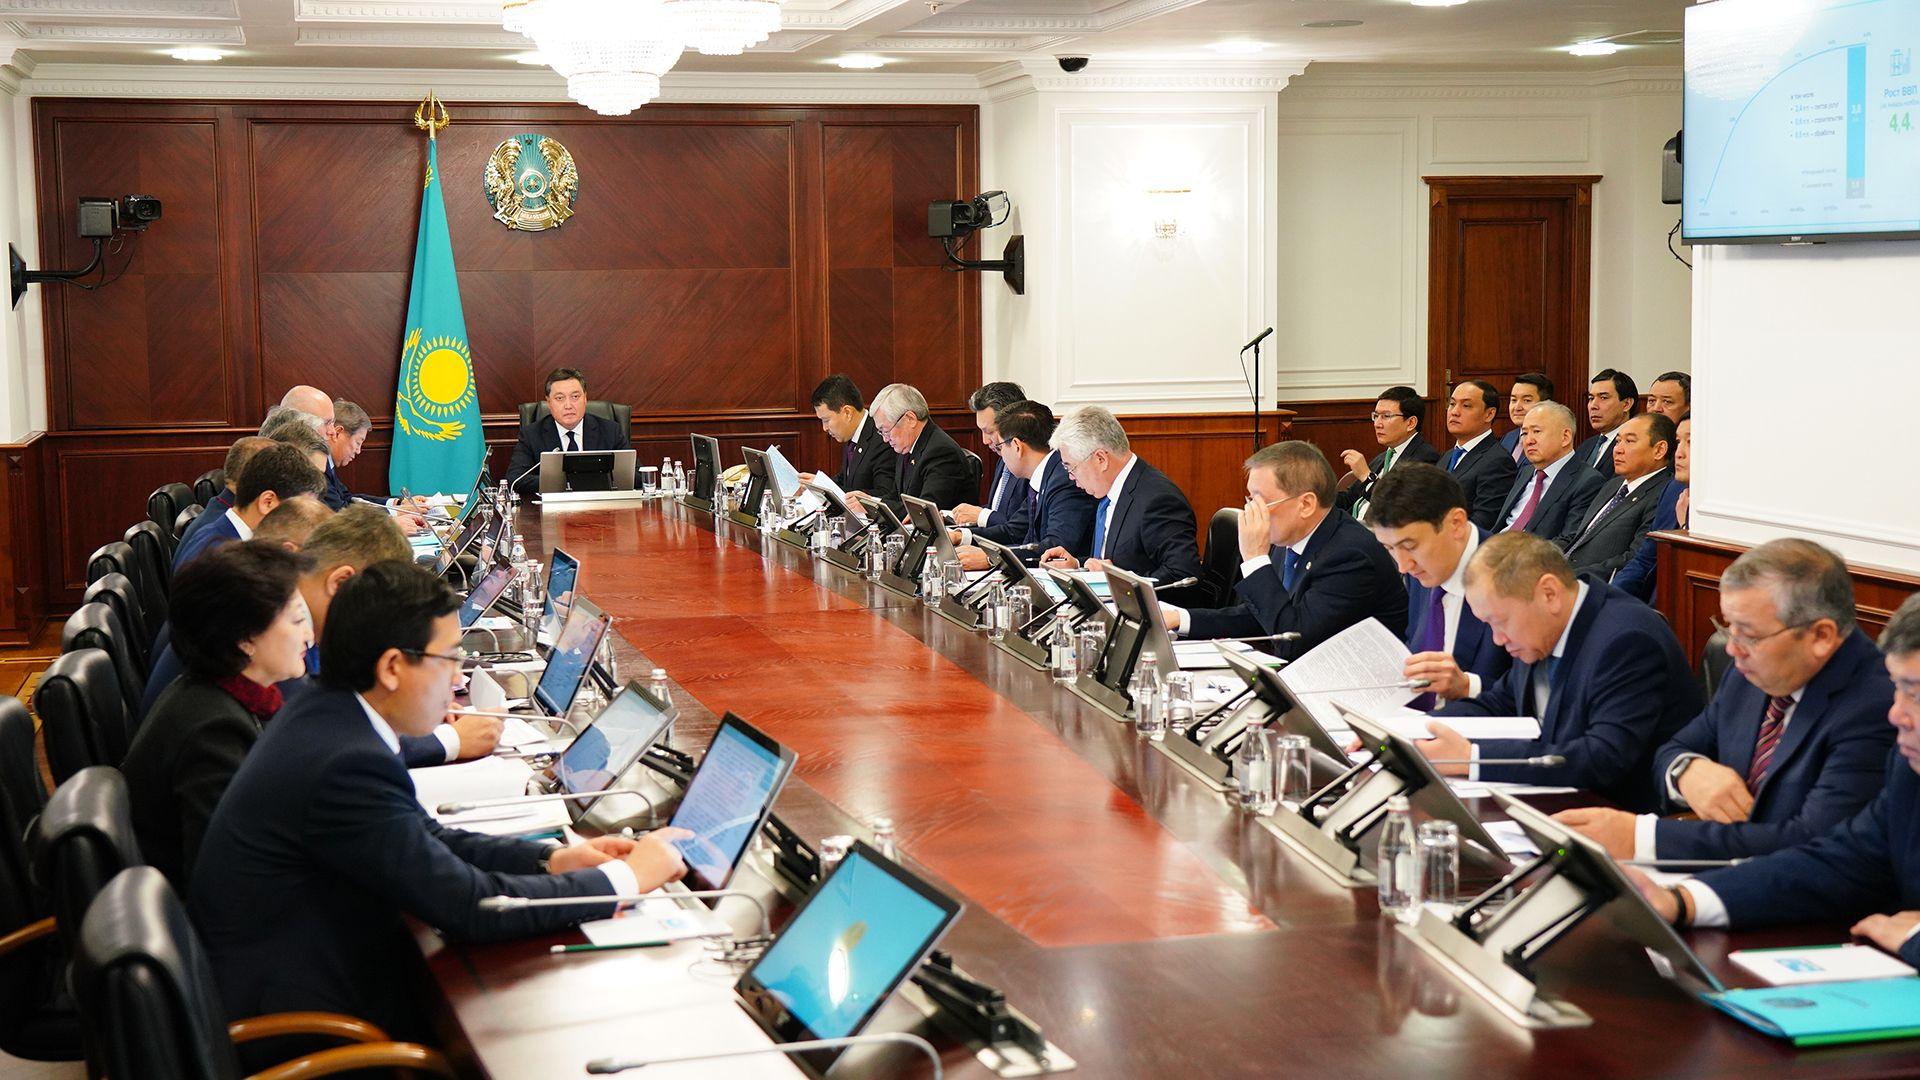 За 11 месяцев рост экономики Казахстана составил 4,4%- Kapital.kz